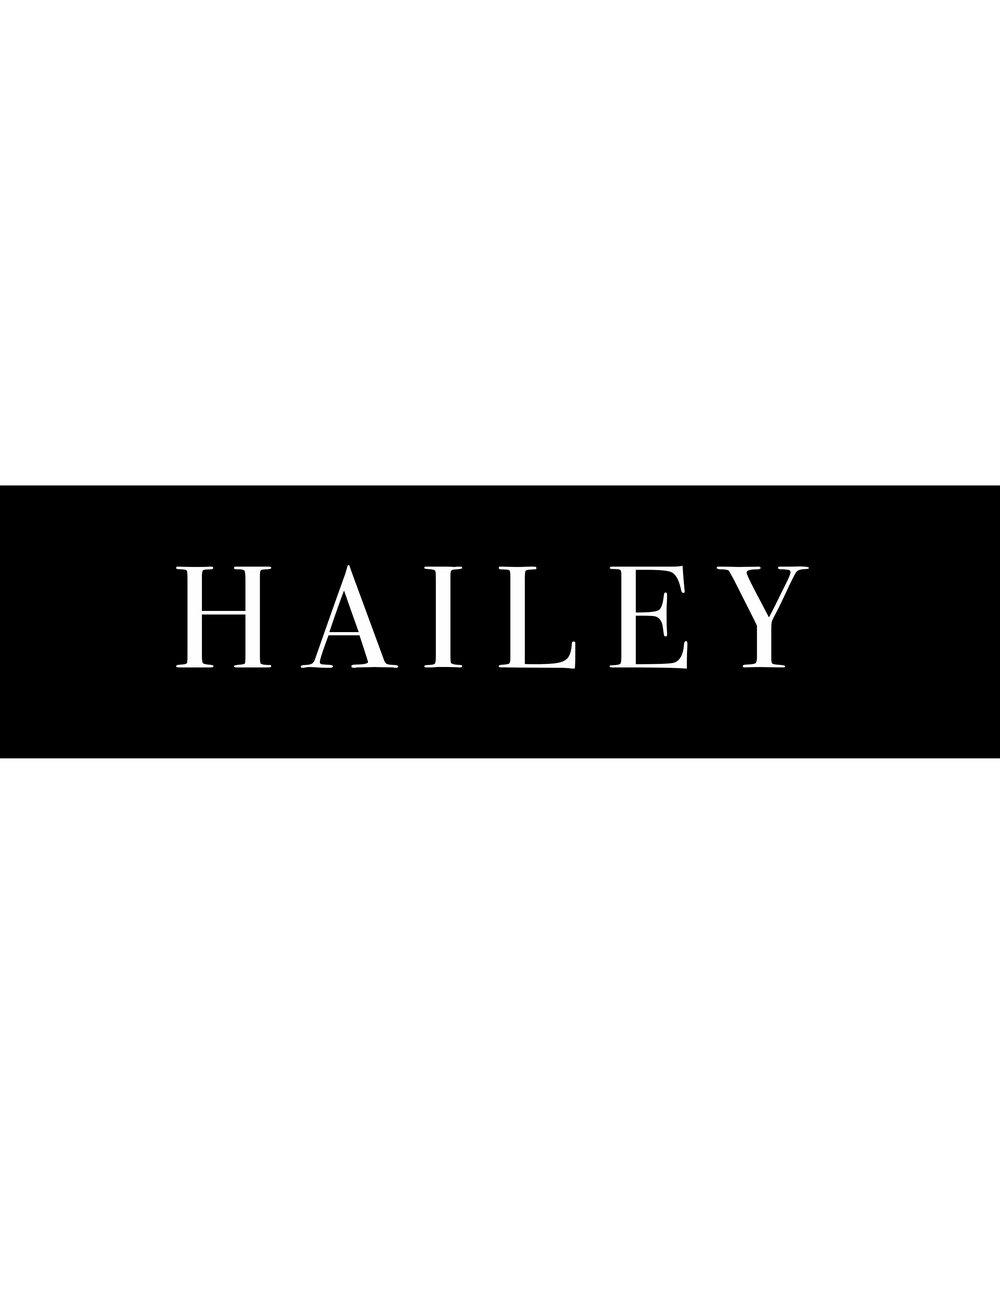 hailey02.jpg